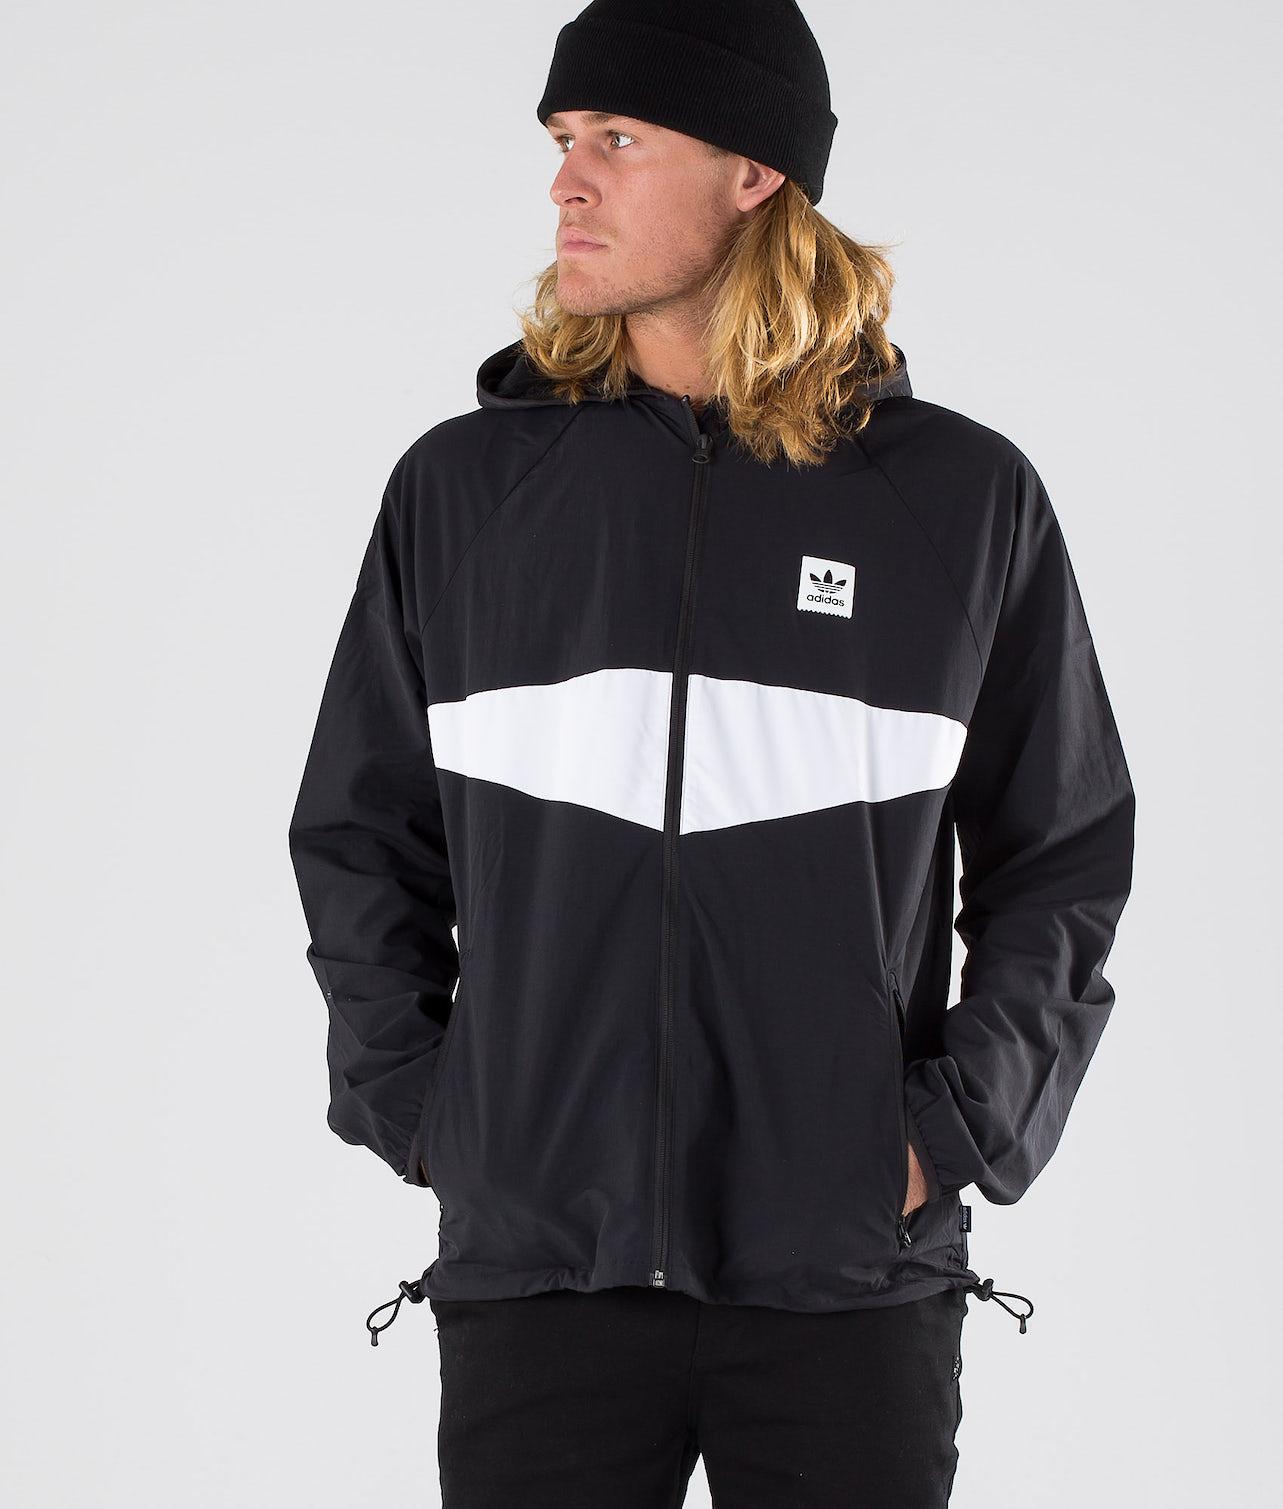 Adidas Skateboarding Dekum Packable Wind Jacka Black/White